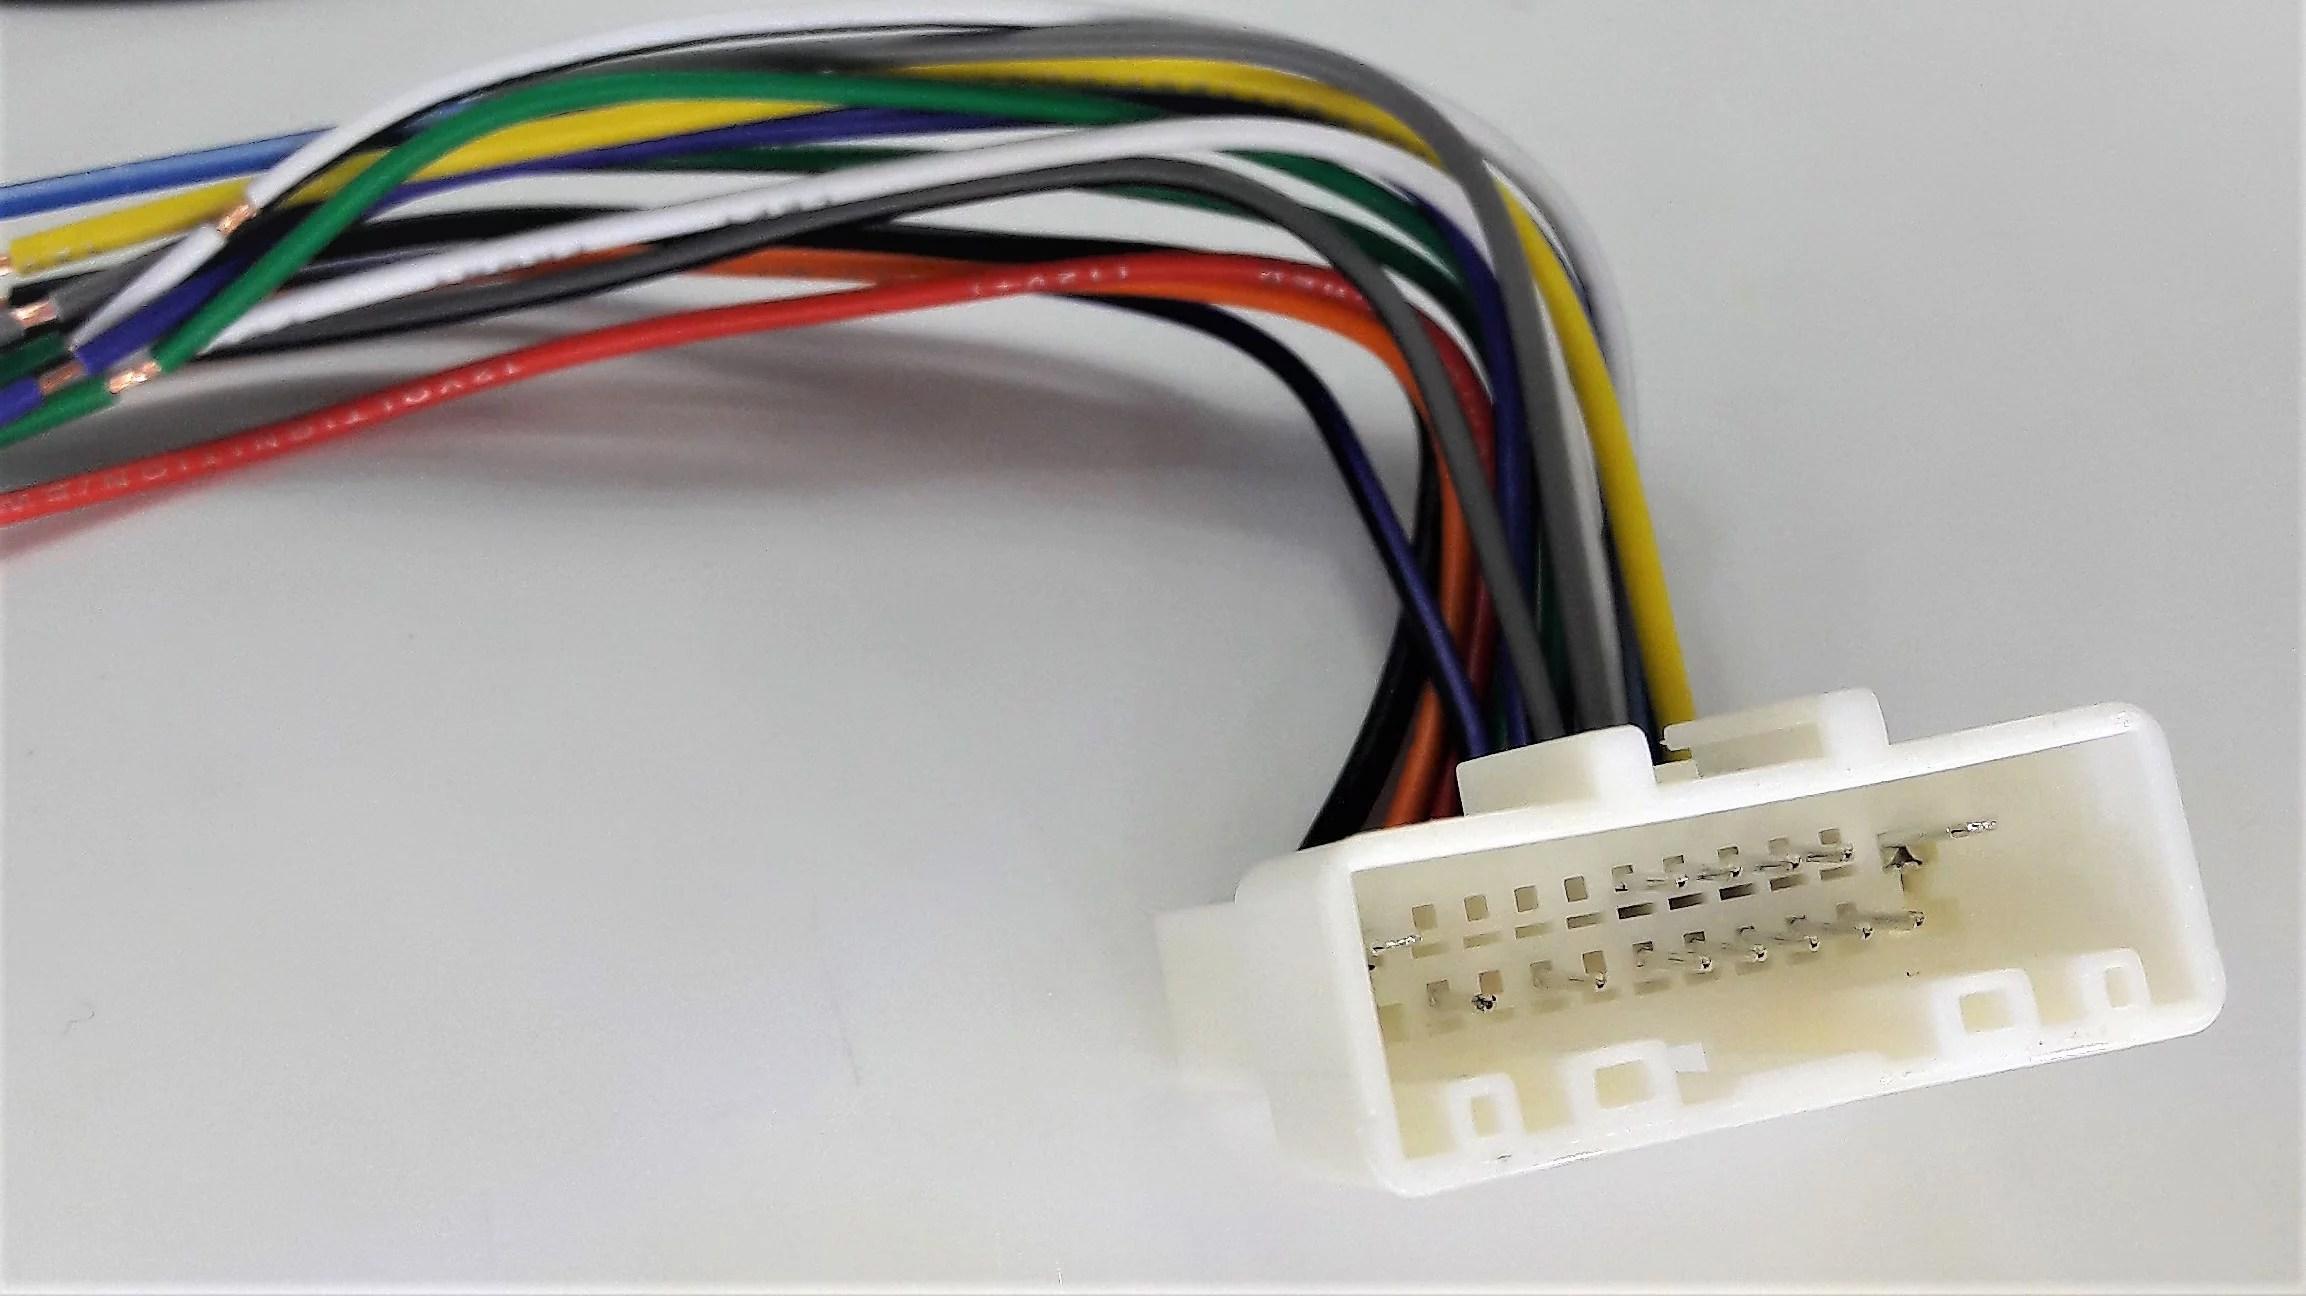 hight resolution of carxtc radio wire harness installs new car stereo fits nissan titancarxtc radio wire harness installs new